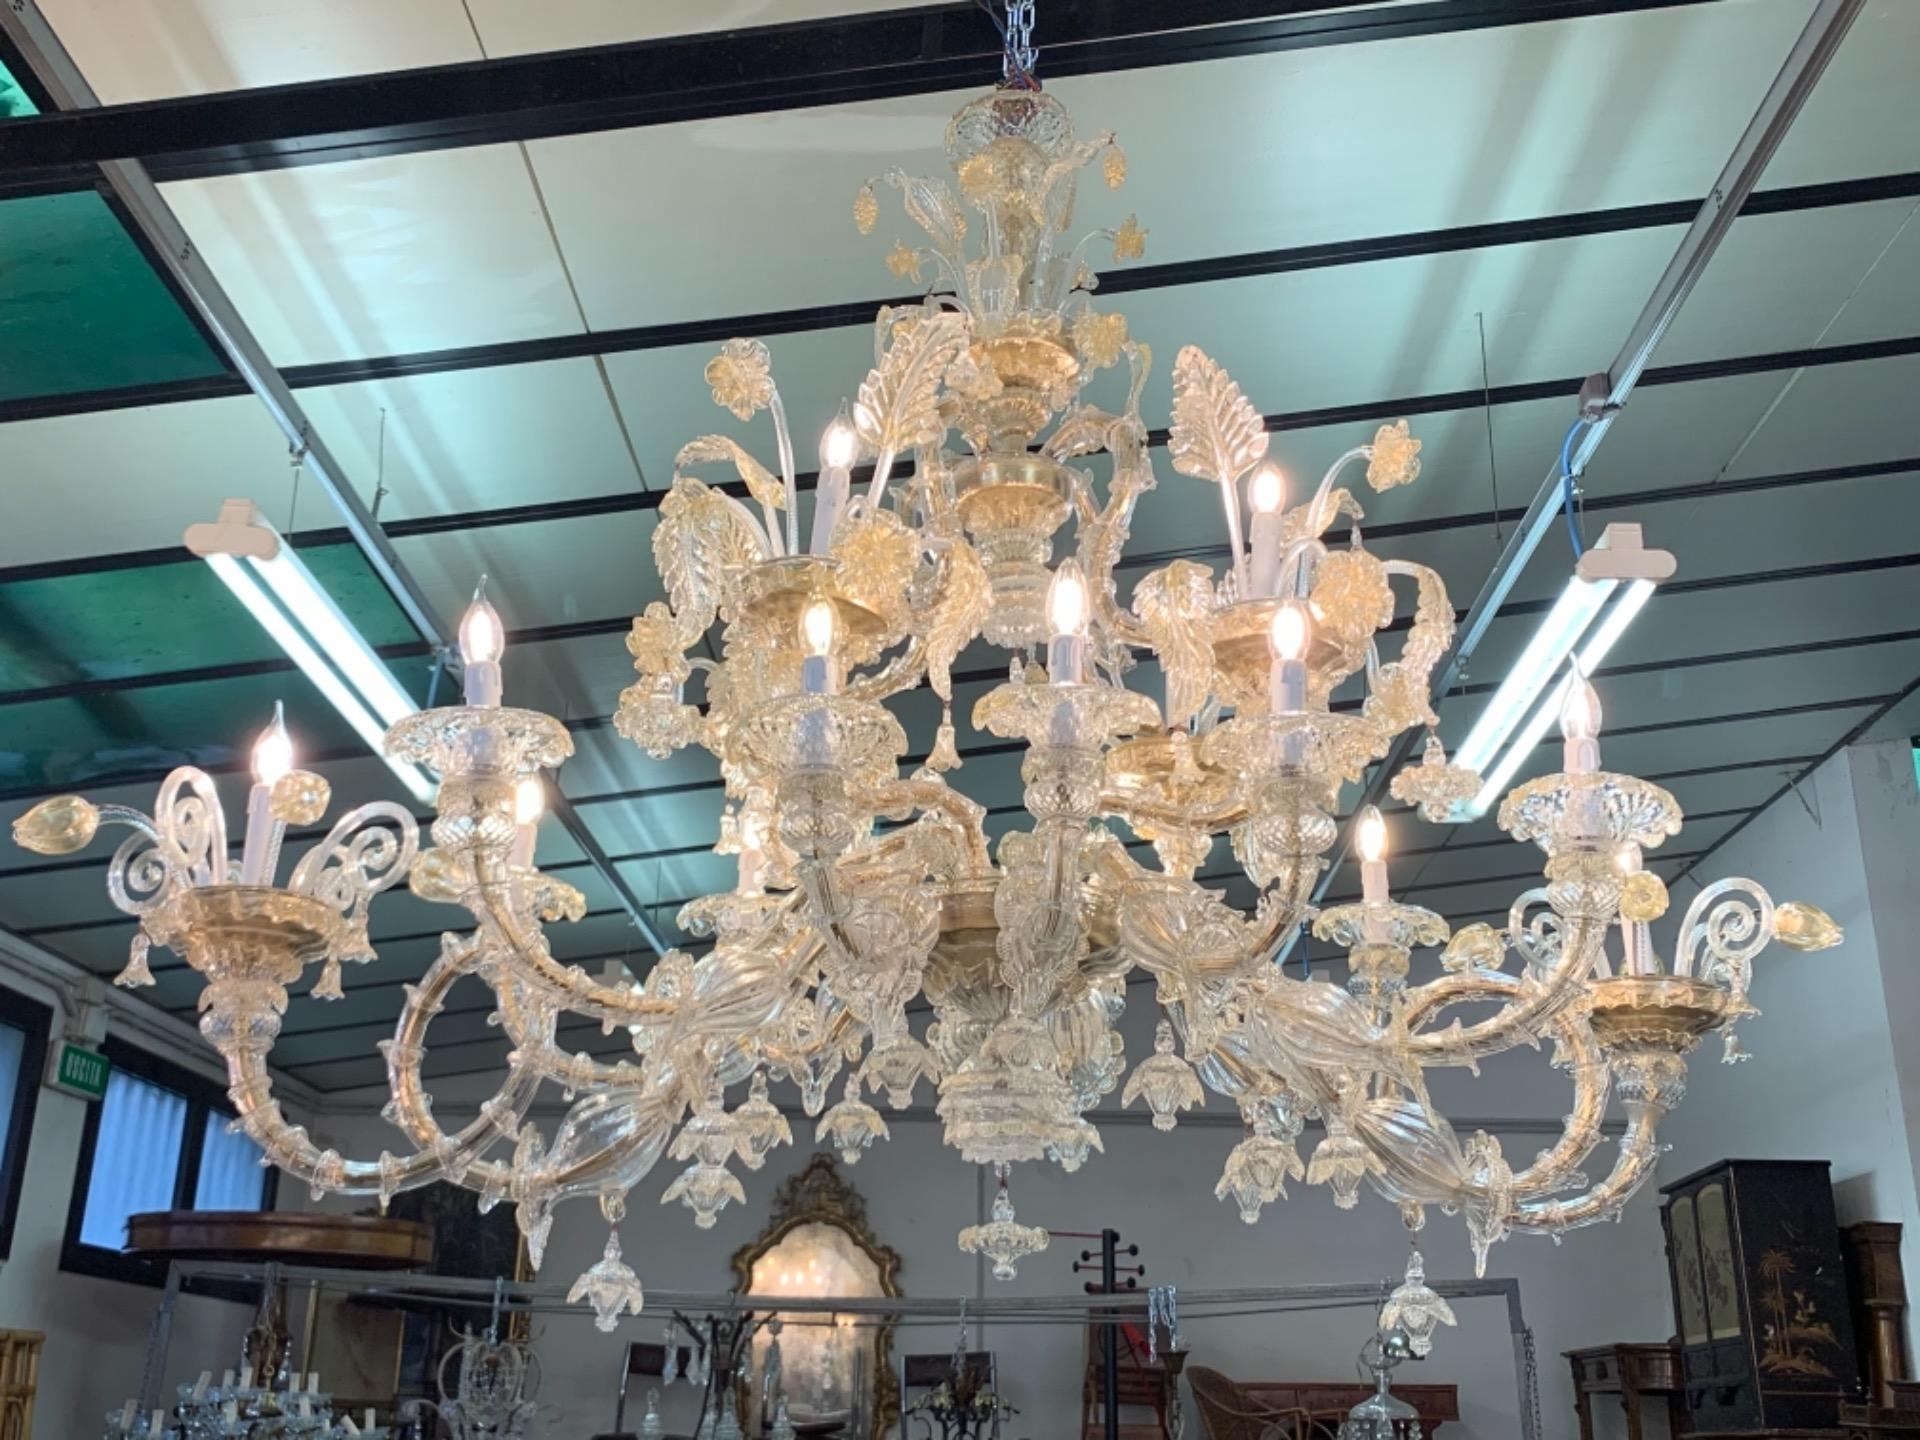 thumb5|Lampadario gondola veneziana vetro di Murano 16 fiamme